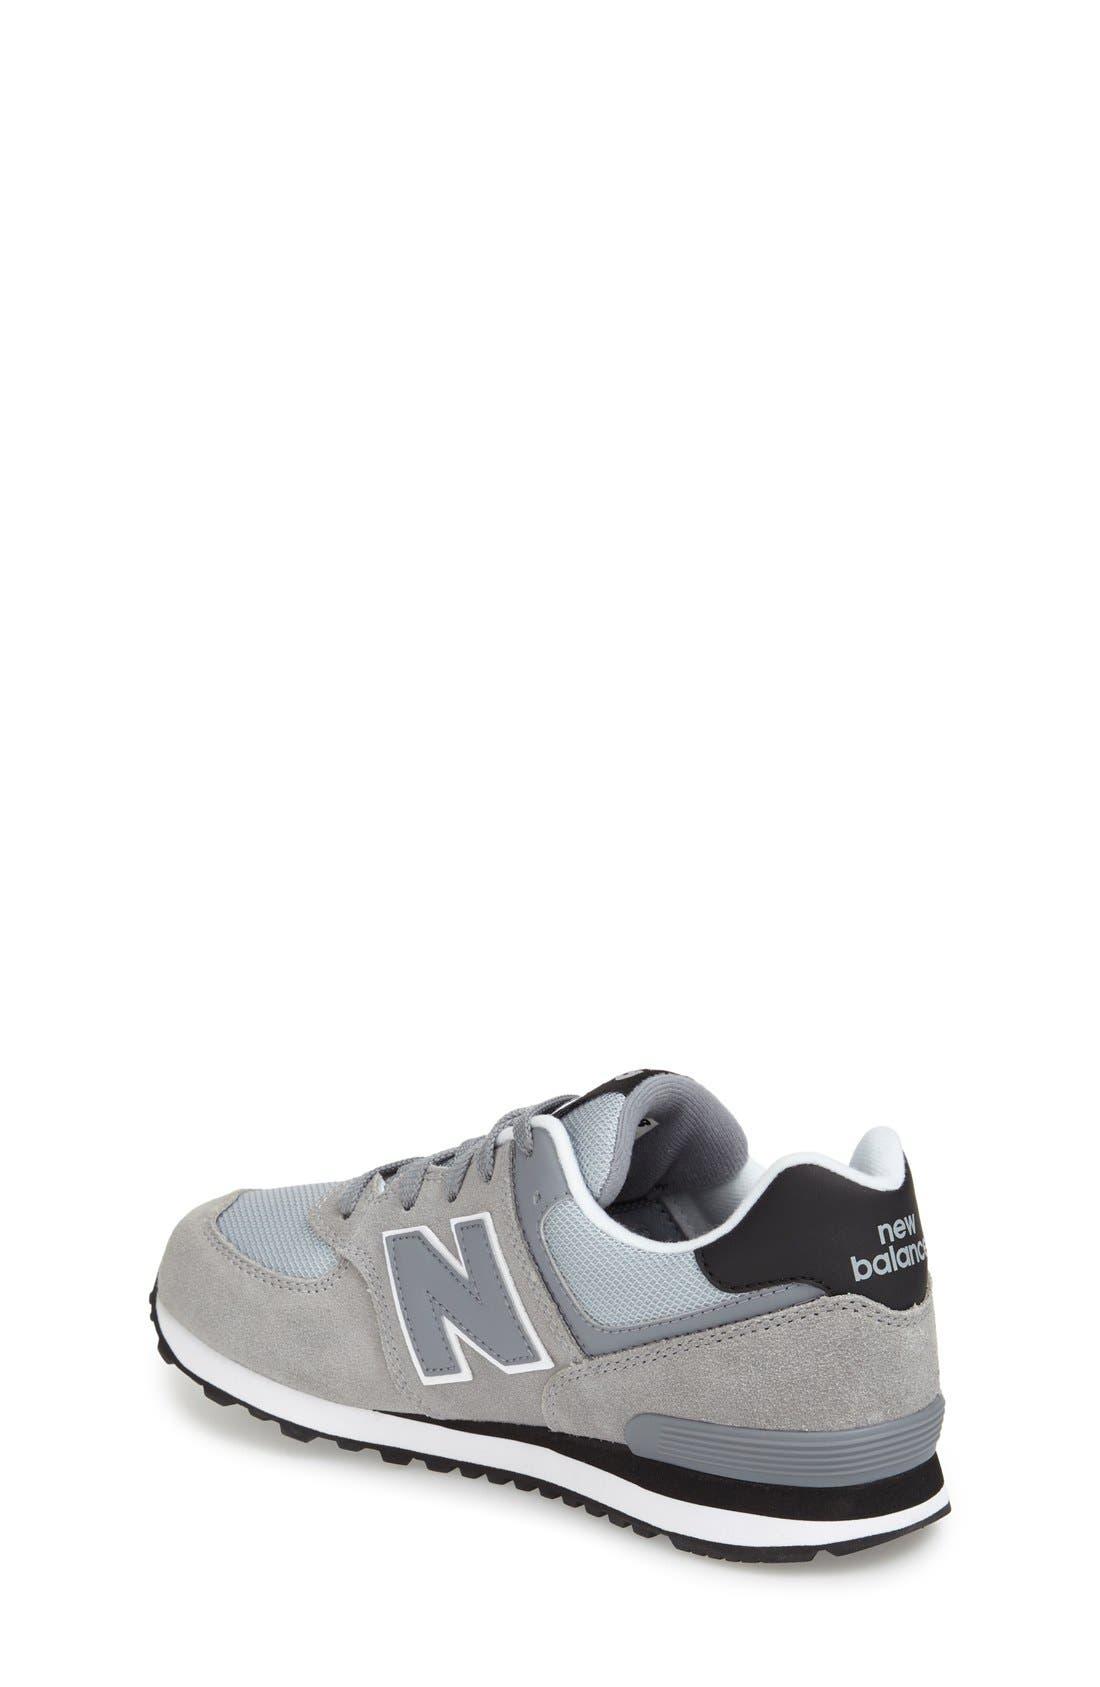 Alternate Image 2  - New Balance '574 Core Plus' Sneaker (Baby, Walker, Toddler, Little Kid & Big Kid)